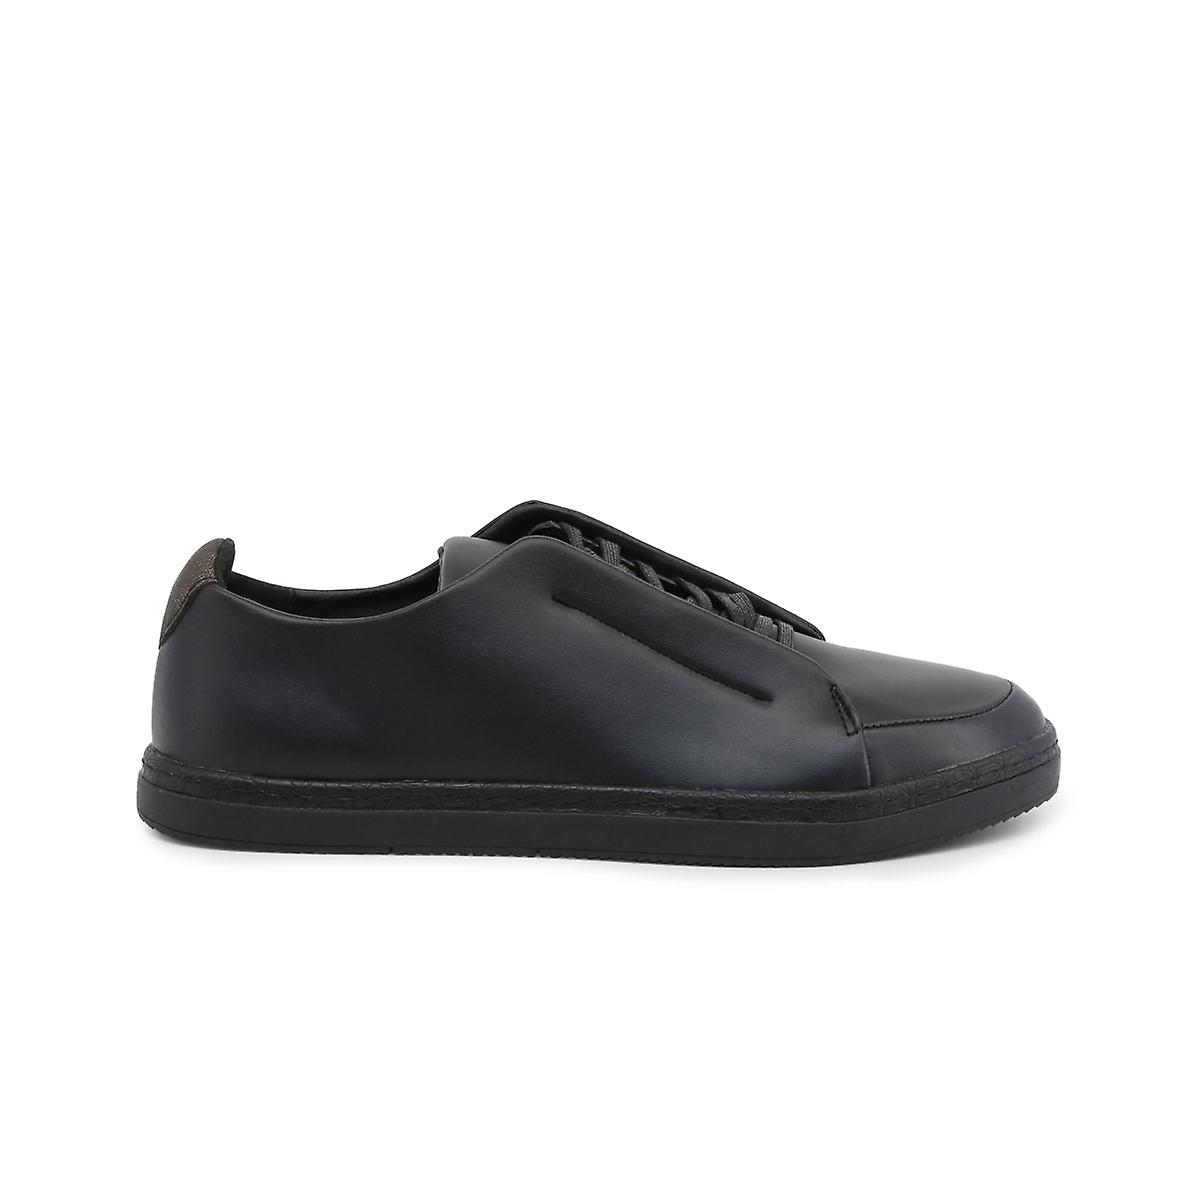 Duca di Morrone Original Men All Year Sneakers - Couleur Noire 29890 - Remise particulière